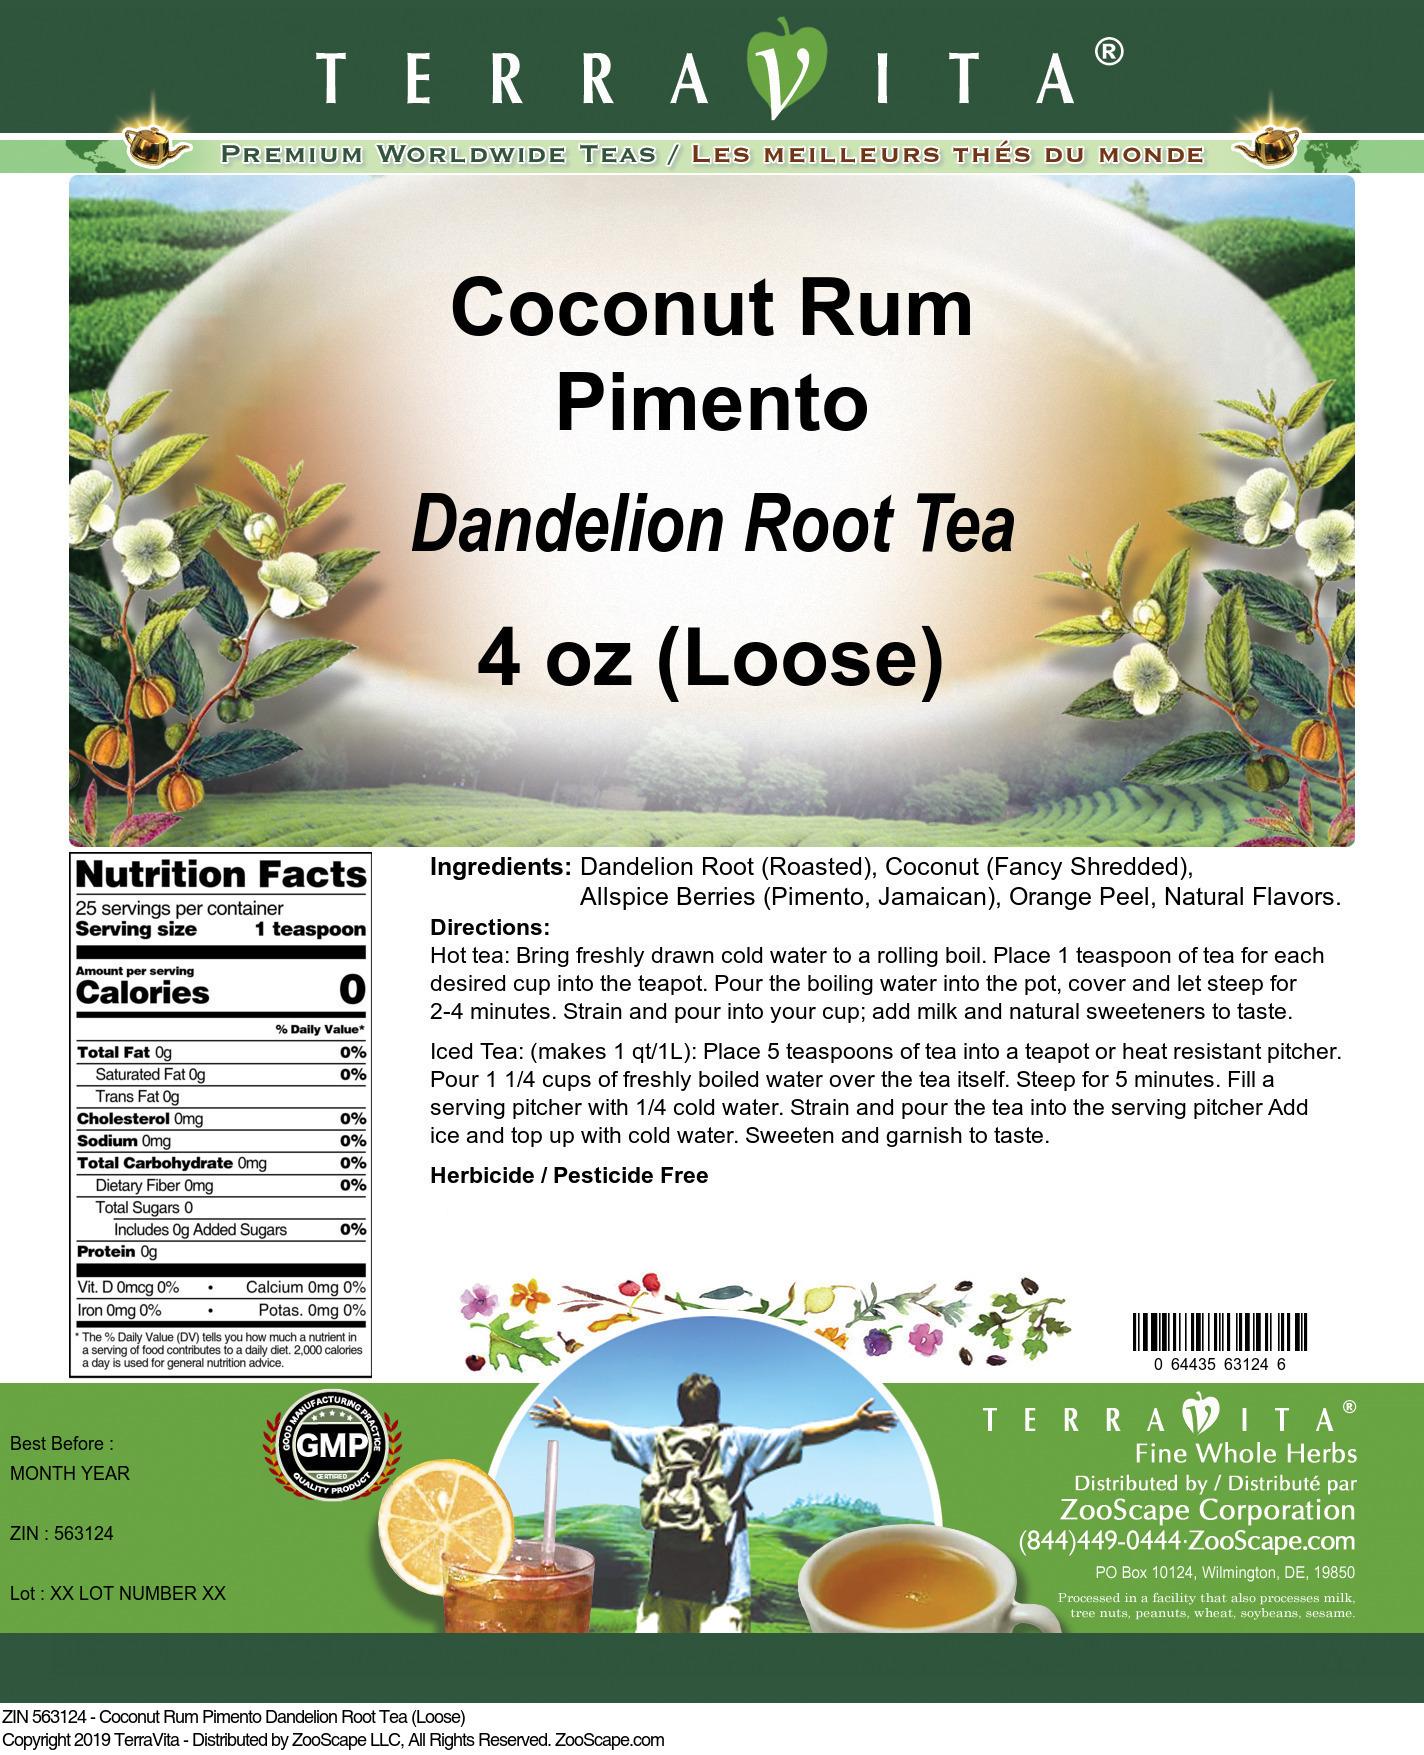 Coconut Rum Pimento Dandelion Root Tea (Loose)